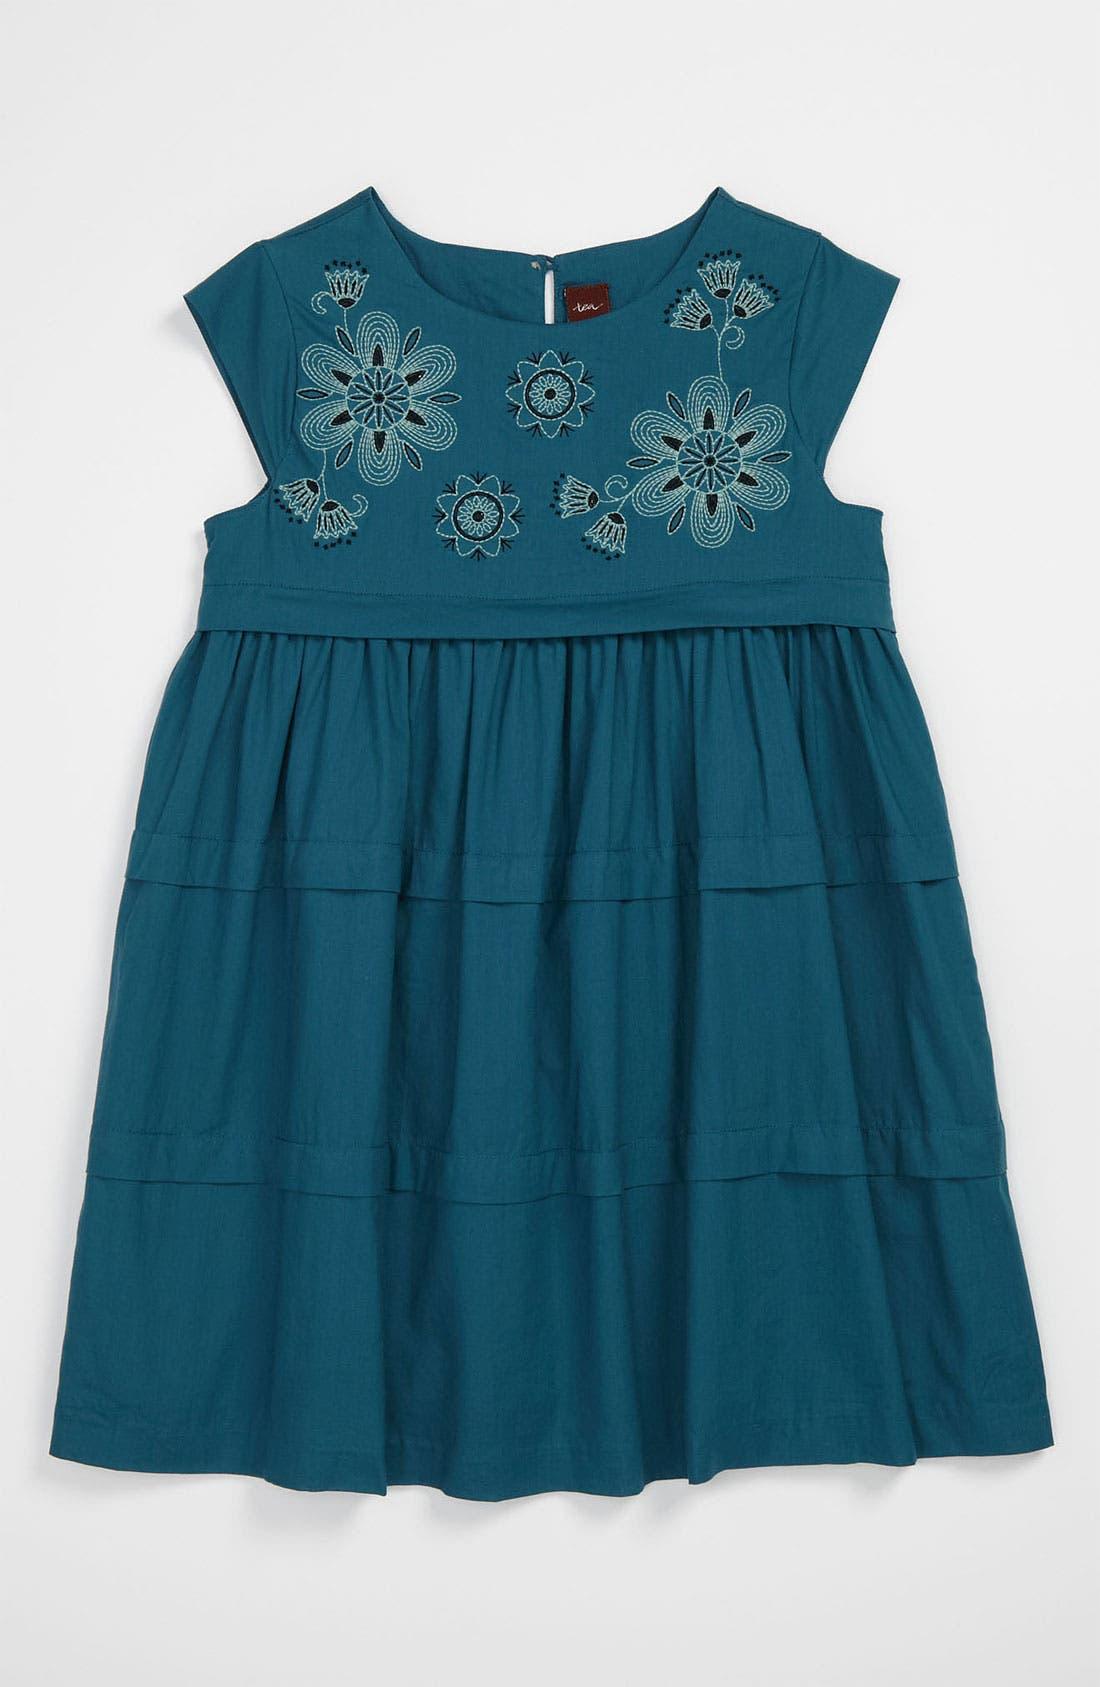 Alternate Image 1 Selected - Tea Collection Needlepoint Floral Dress (Little Girls & Big Girls)